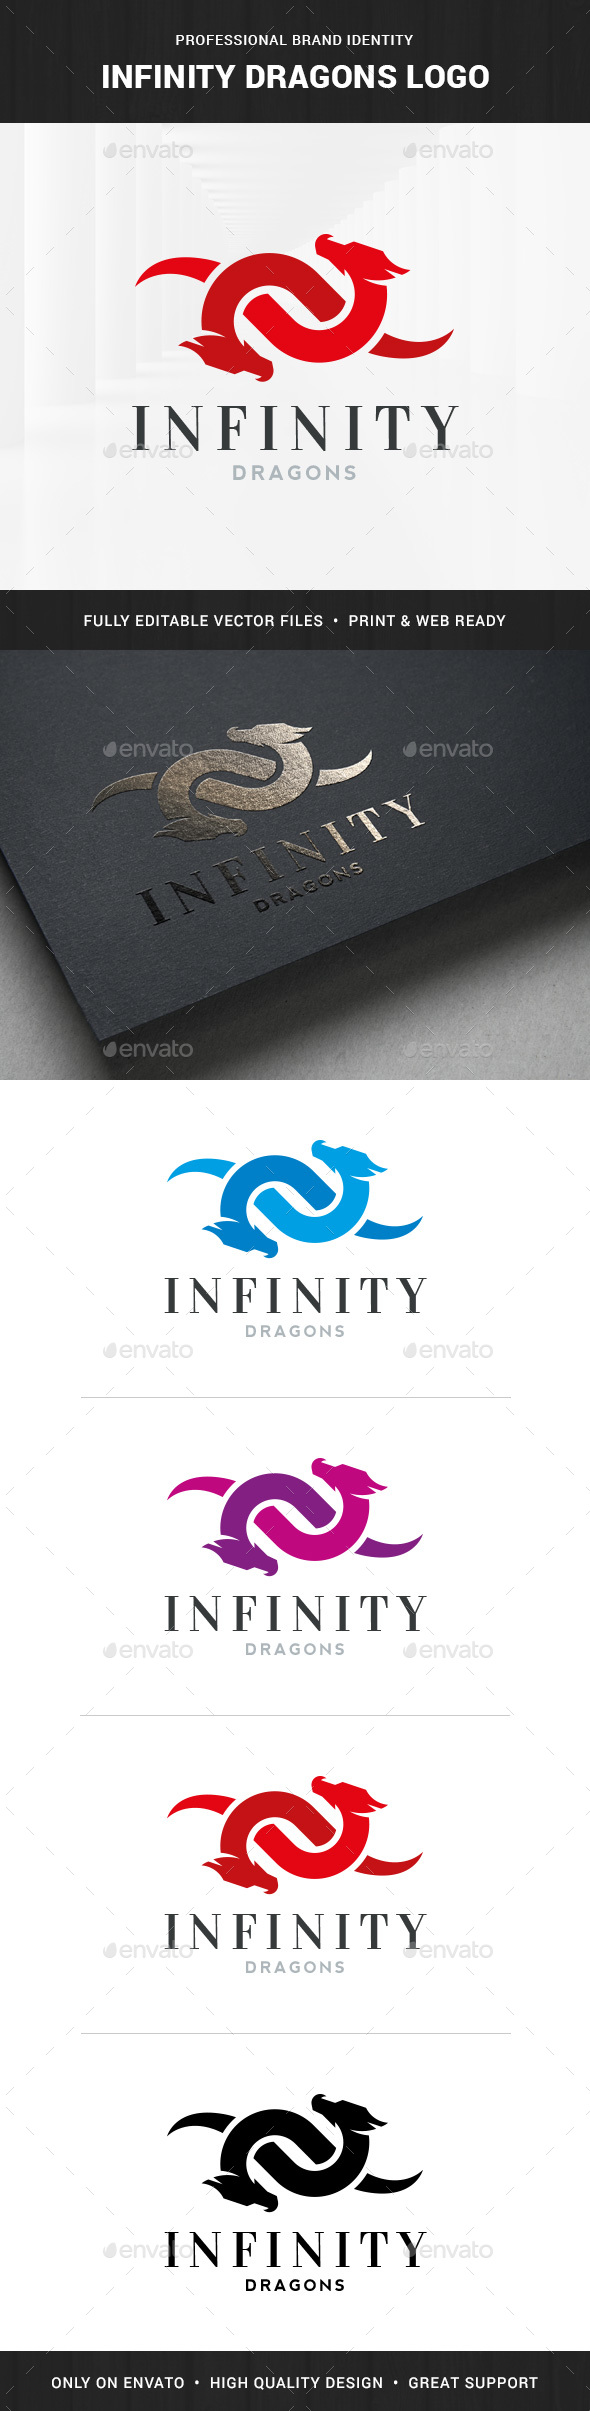 Infinity Dragons Logo Template